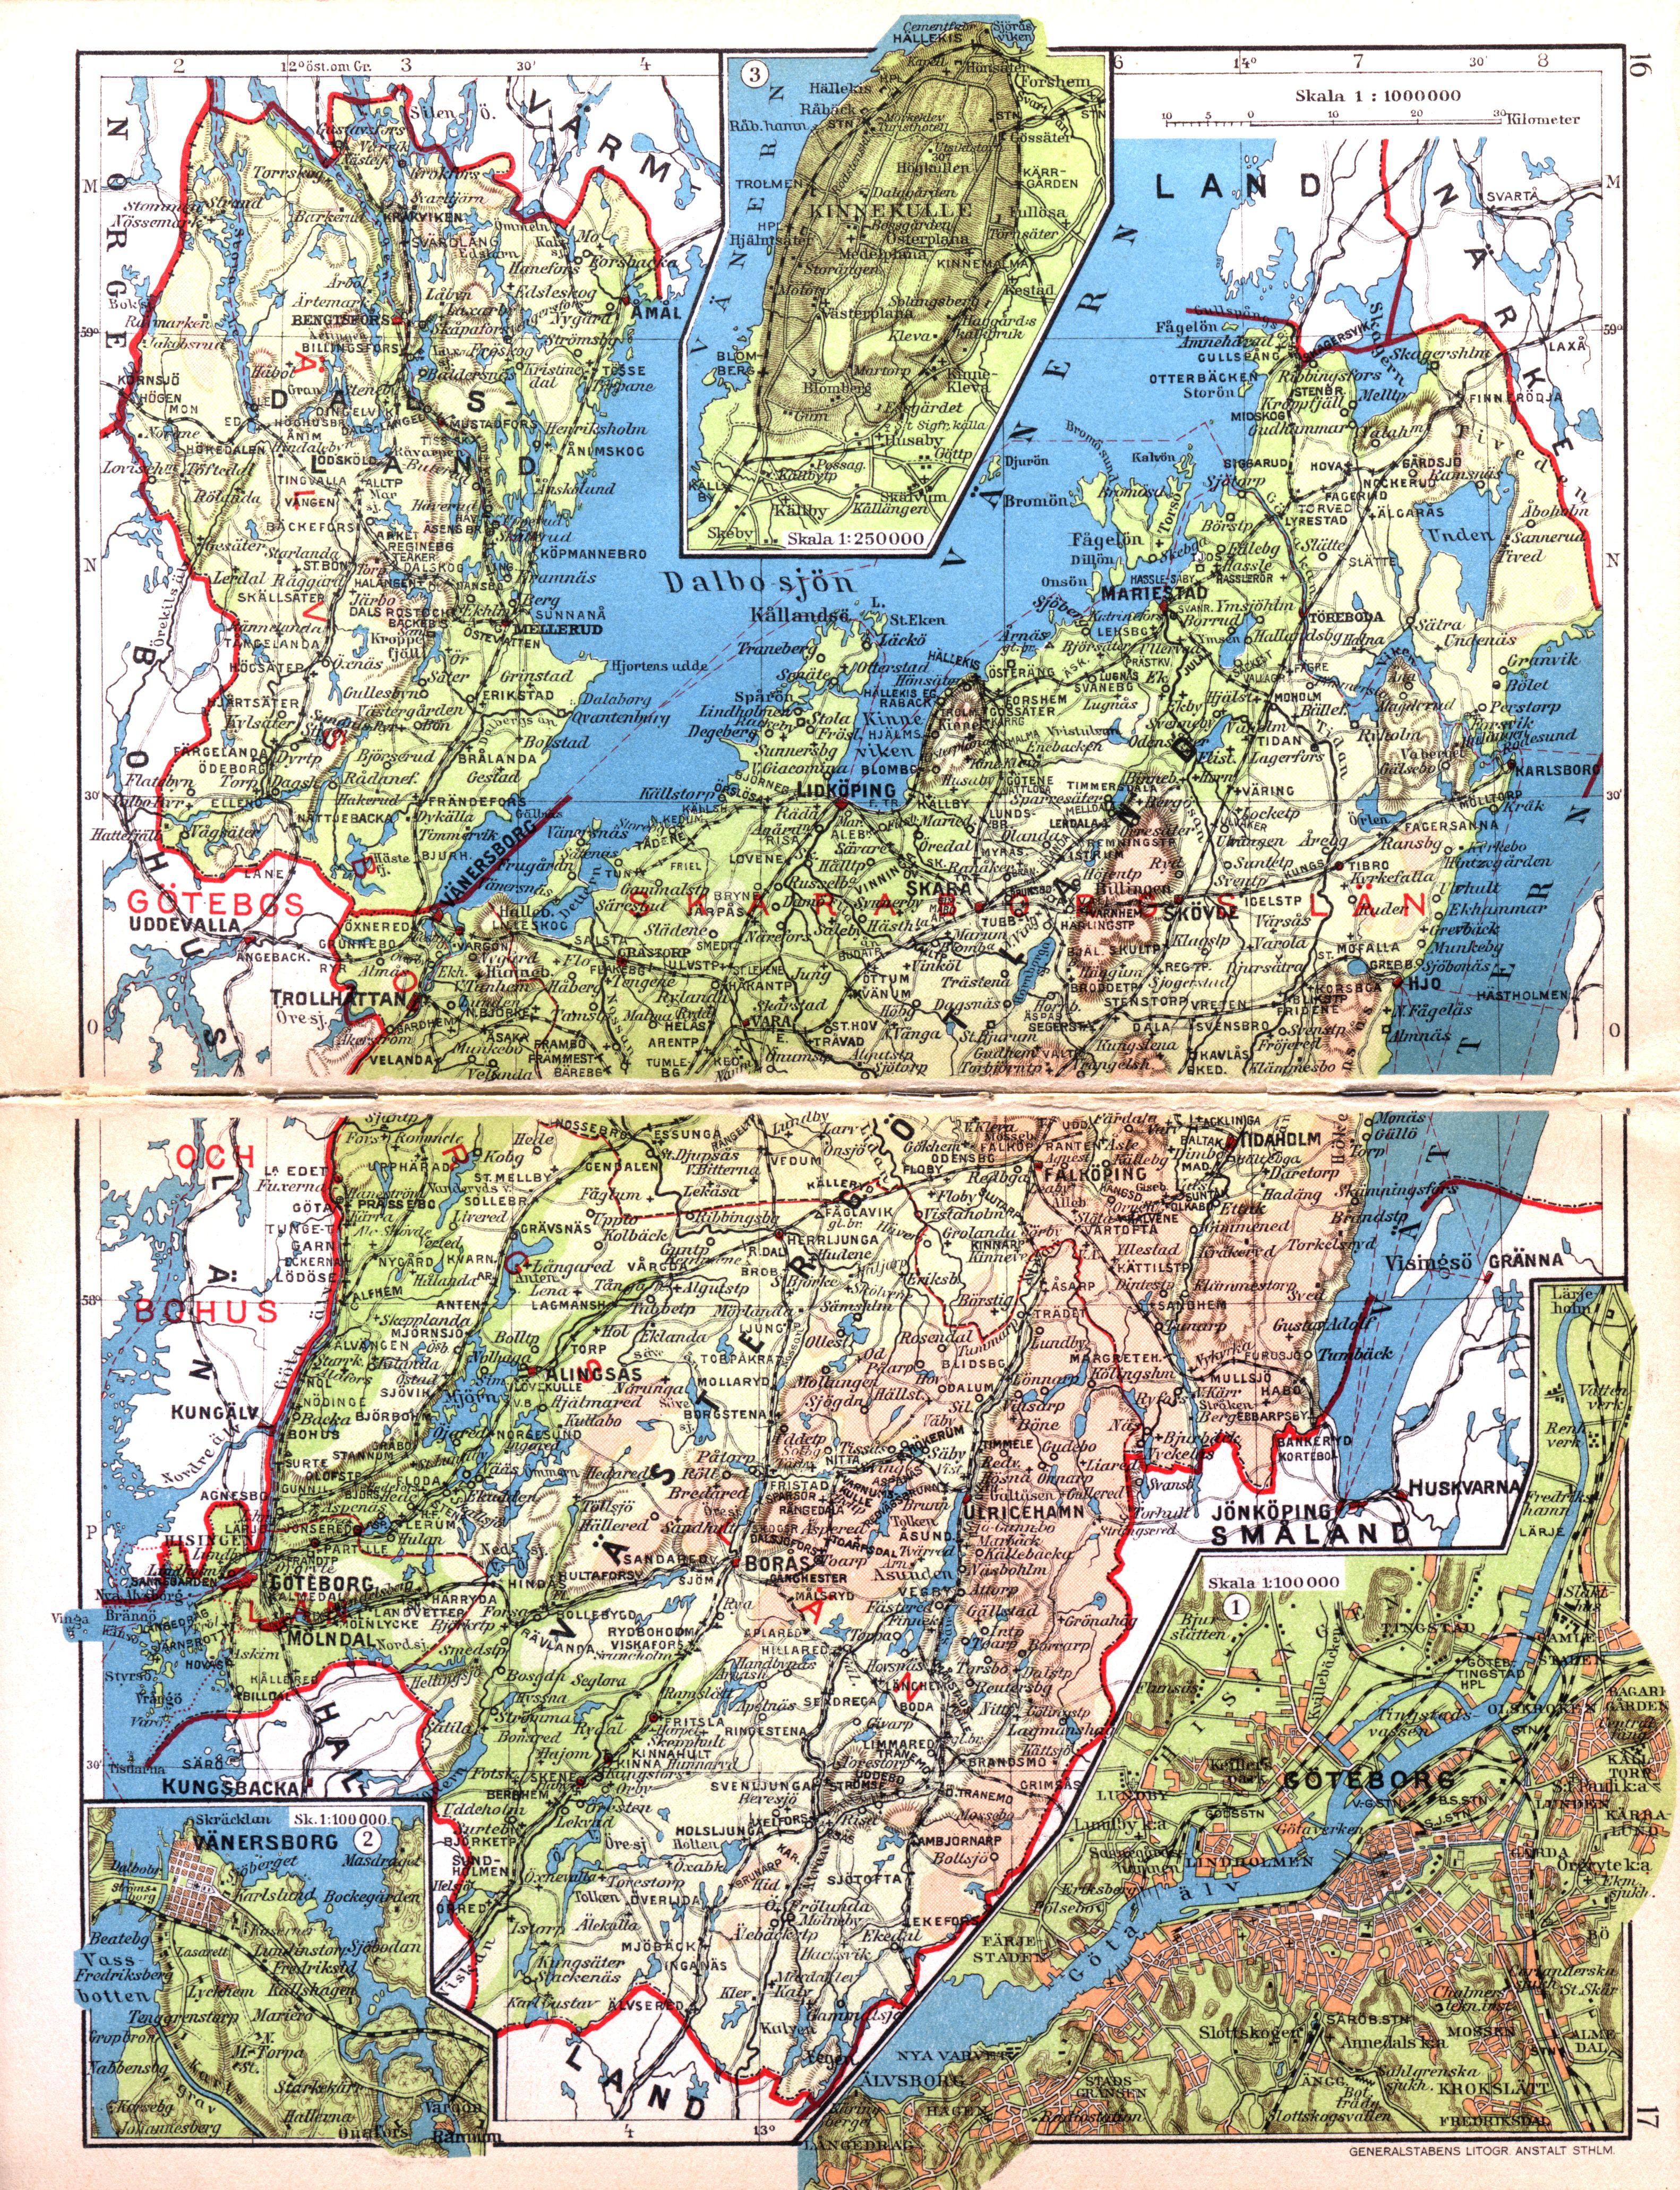 karta västergötland